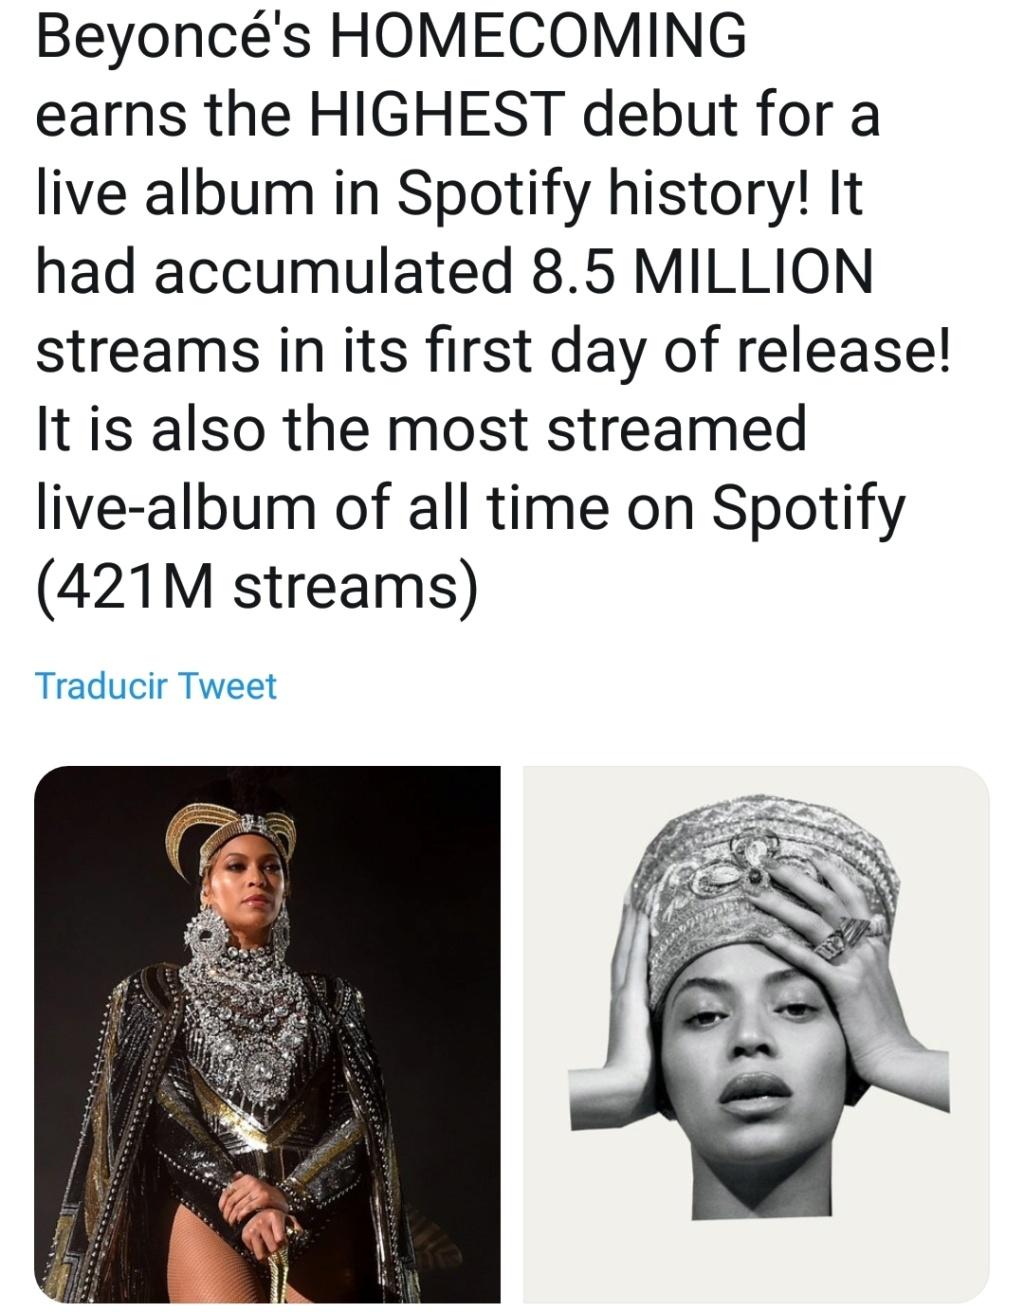 Beyoncé >> preparando nuevo álbum - Página 33 Img_2237